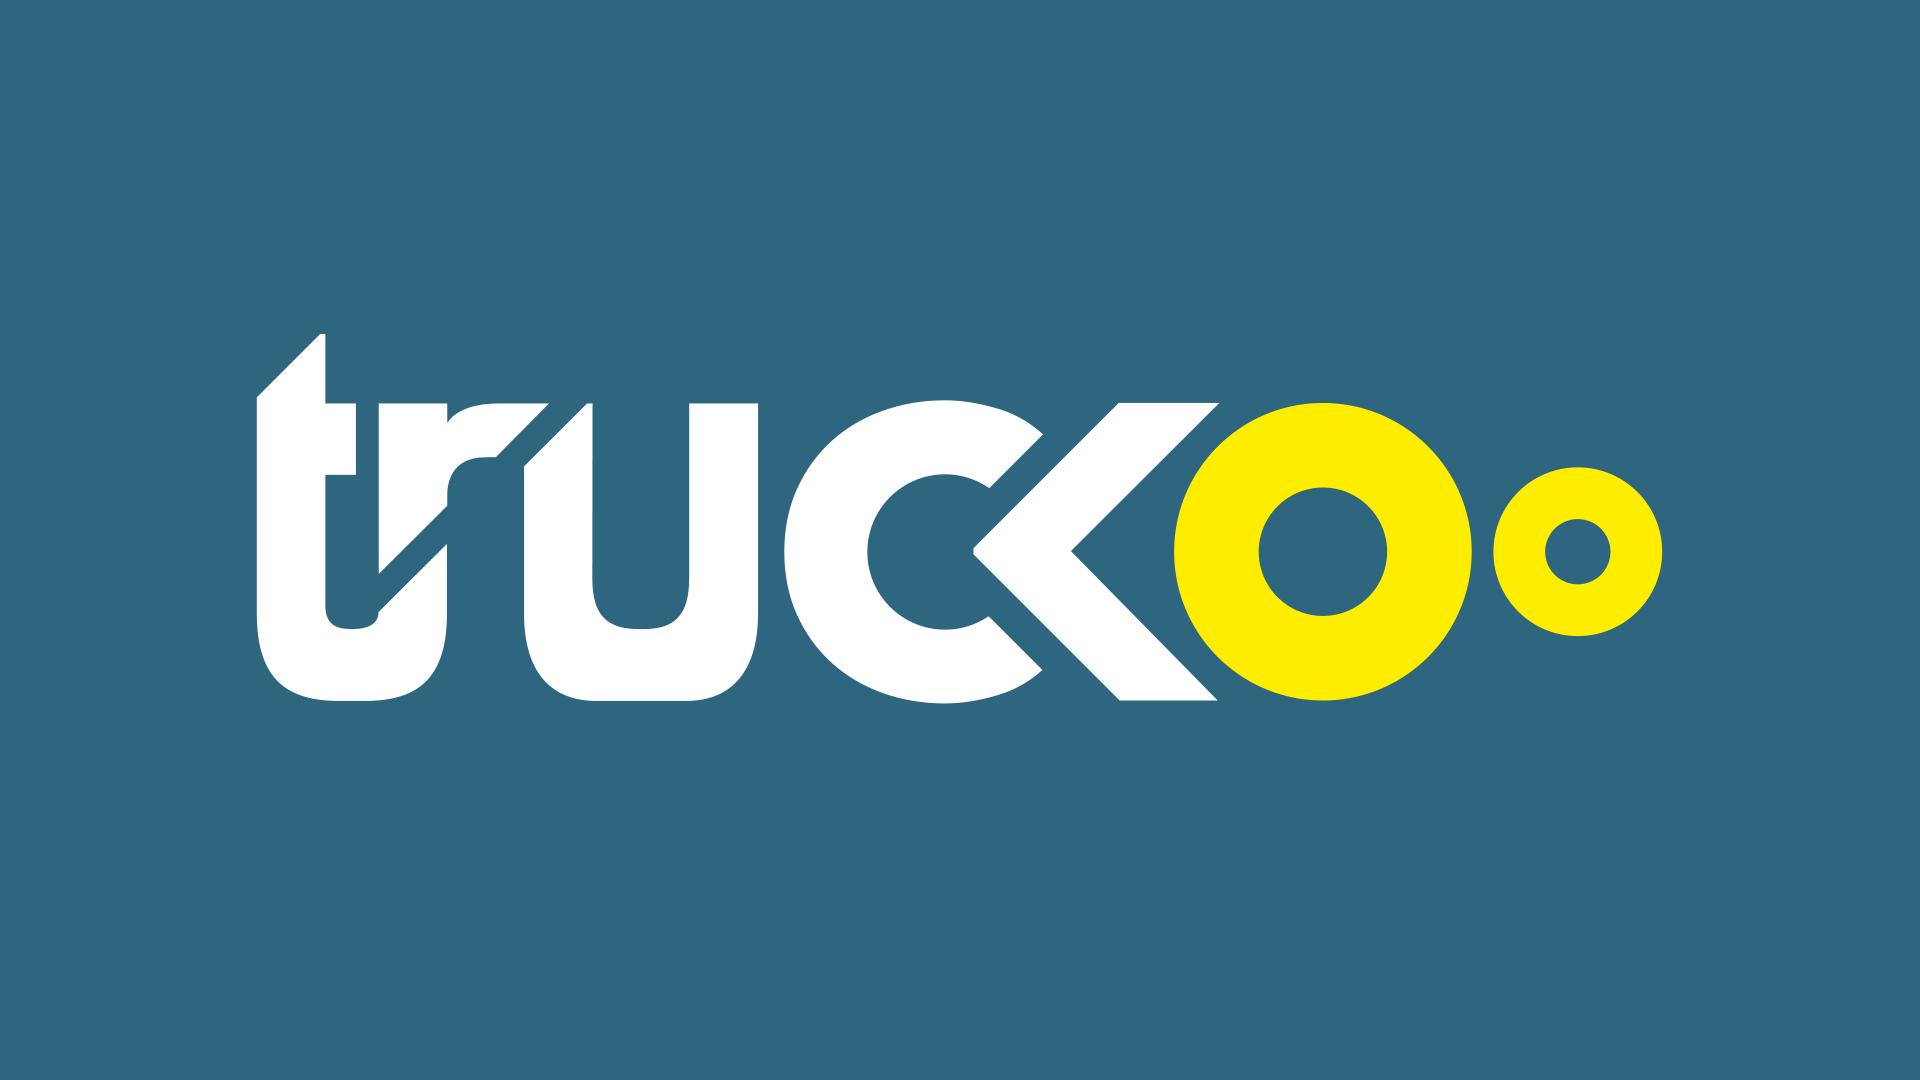 Truckoo_BrandingCase_CD_2019_logo_bg_1980x1080px